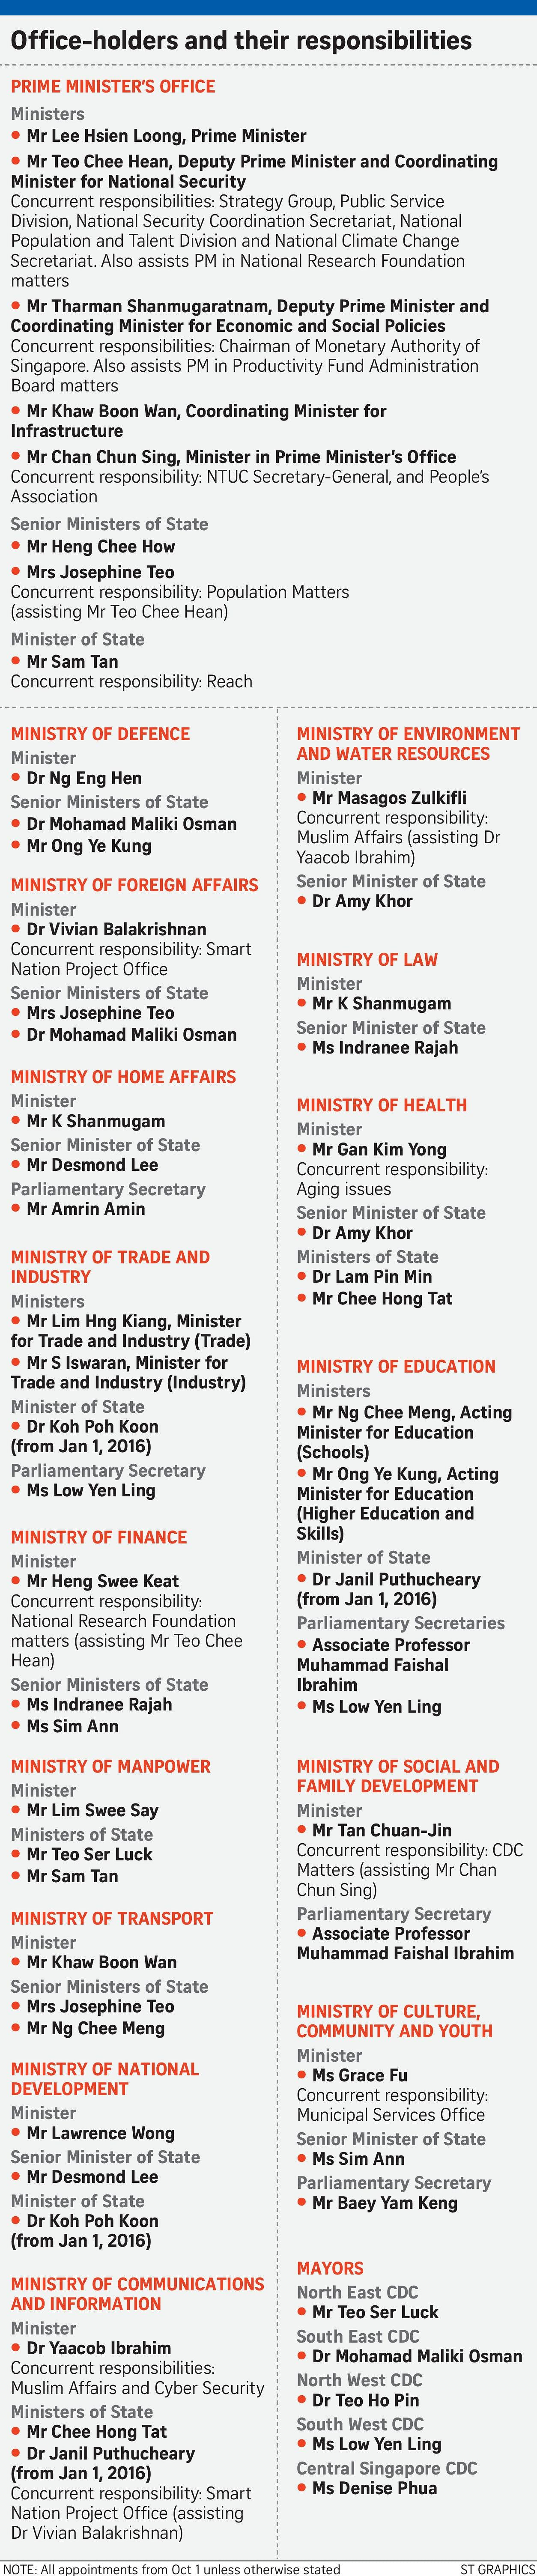 Role on world stage not new to Vivian Balakrishnan, Politics News ...